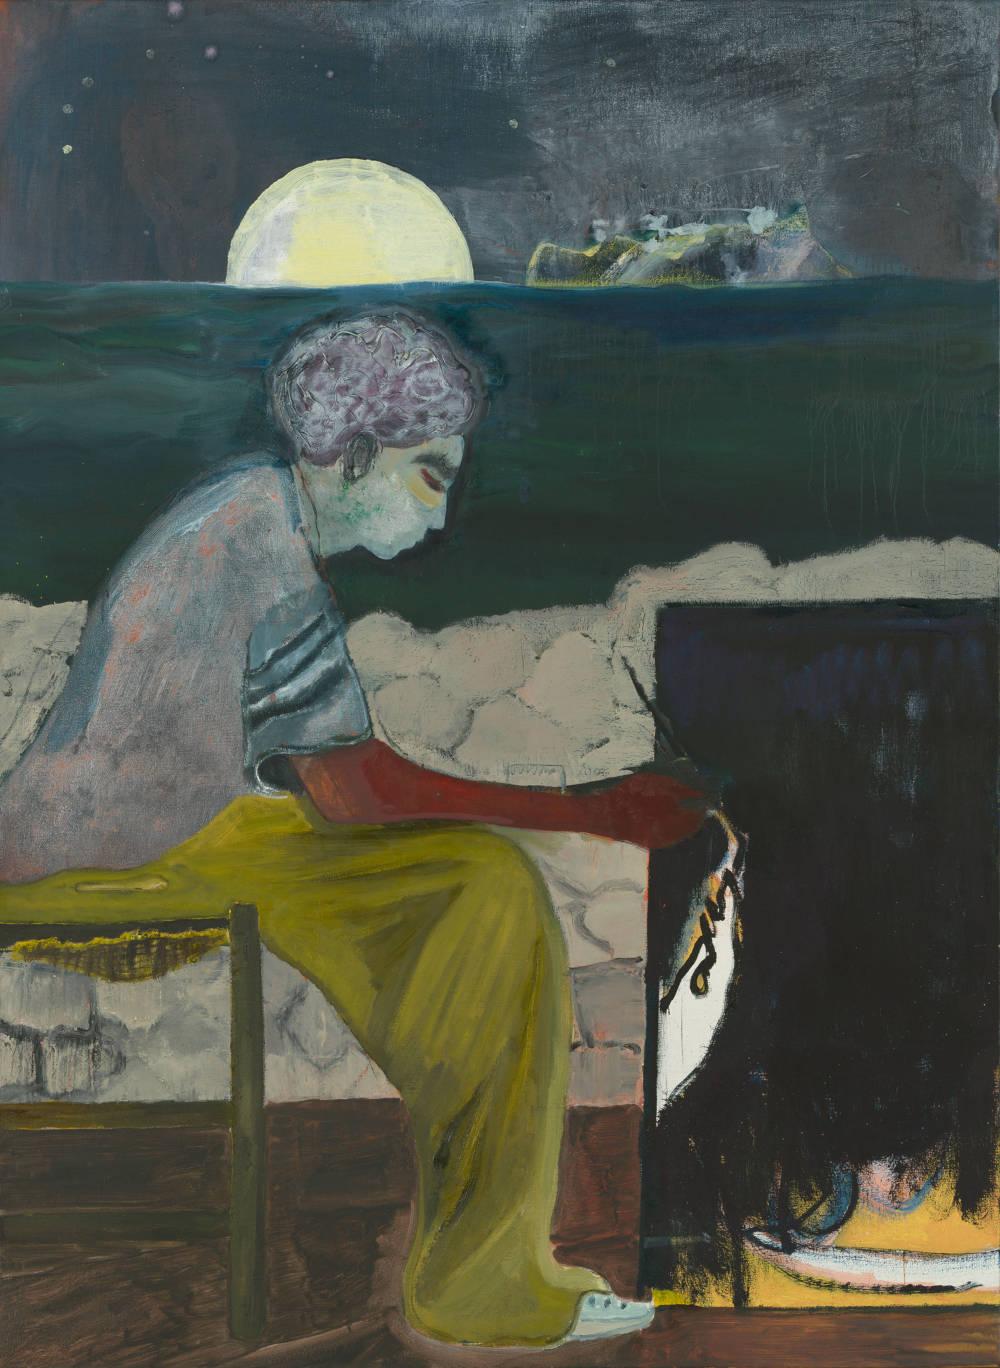 Painting on an Island (Carrera)